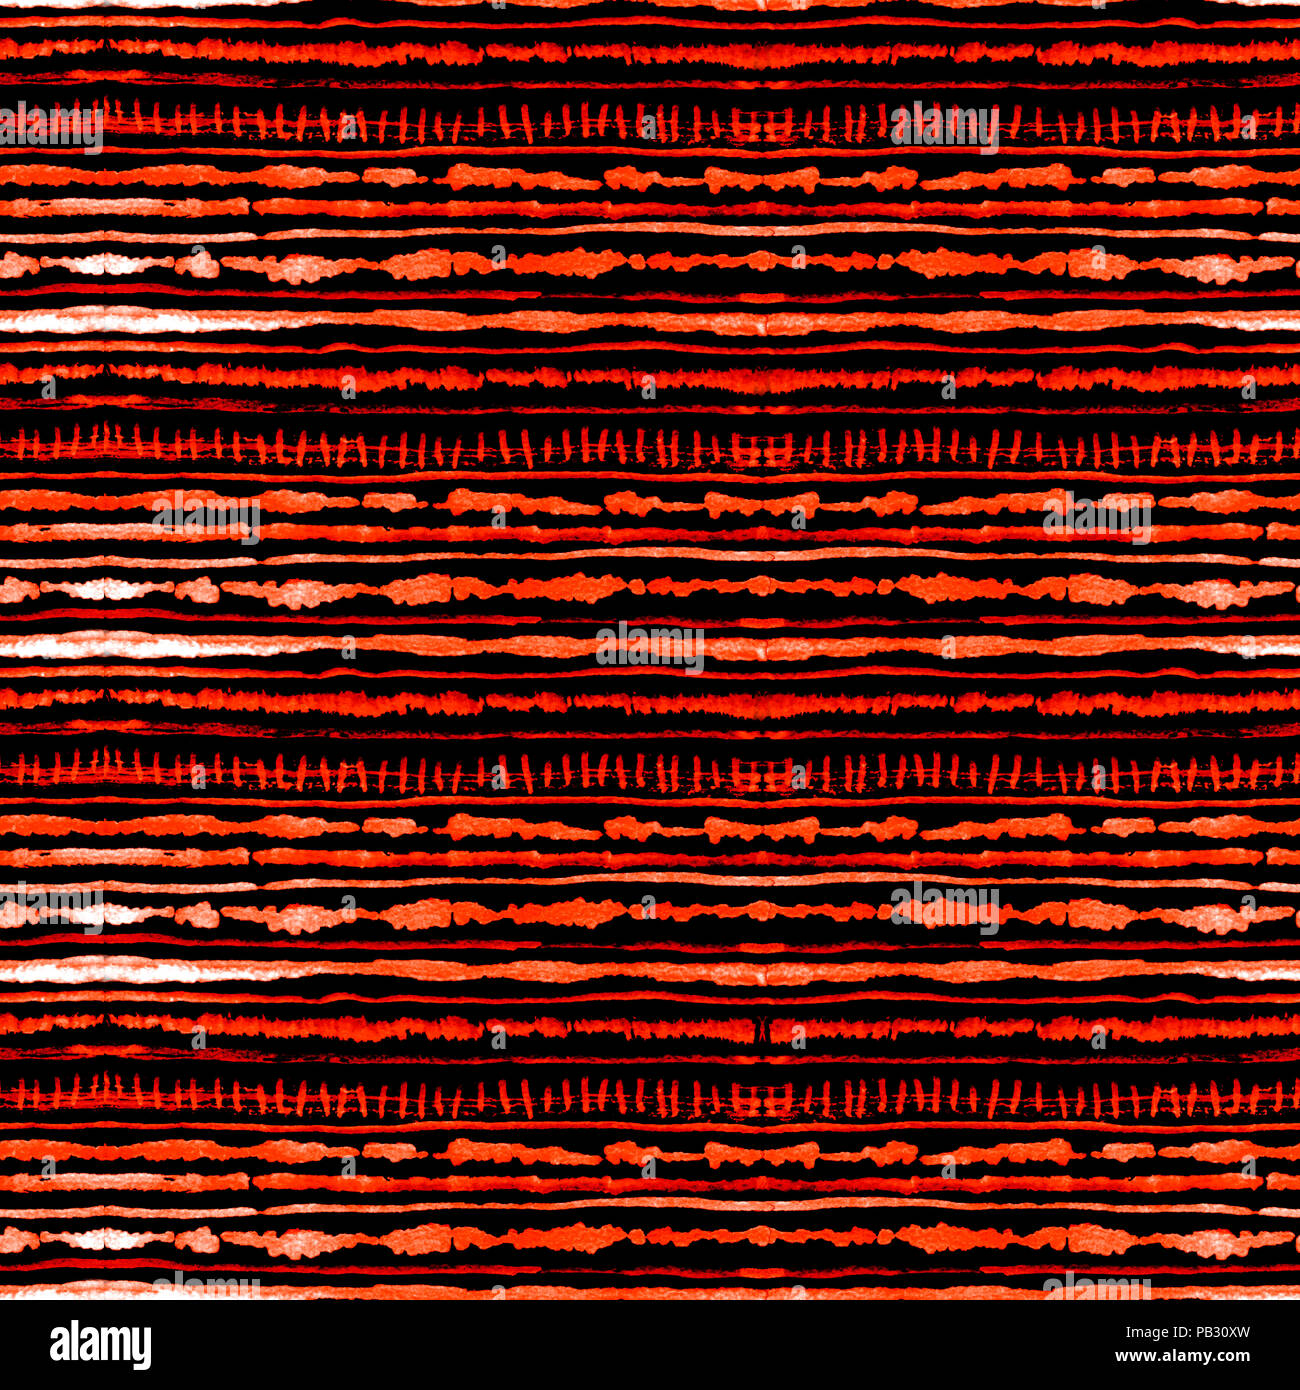 Seamless watercolour shibori tie-dye pattern of red color on